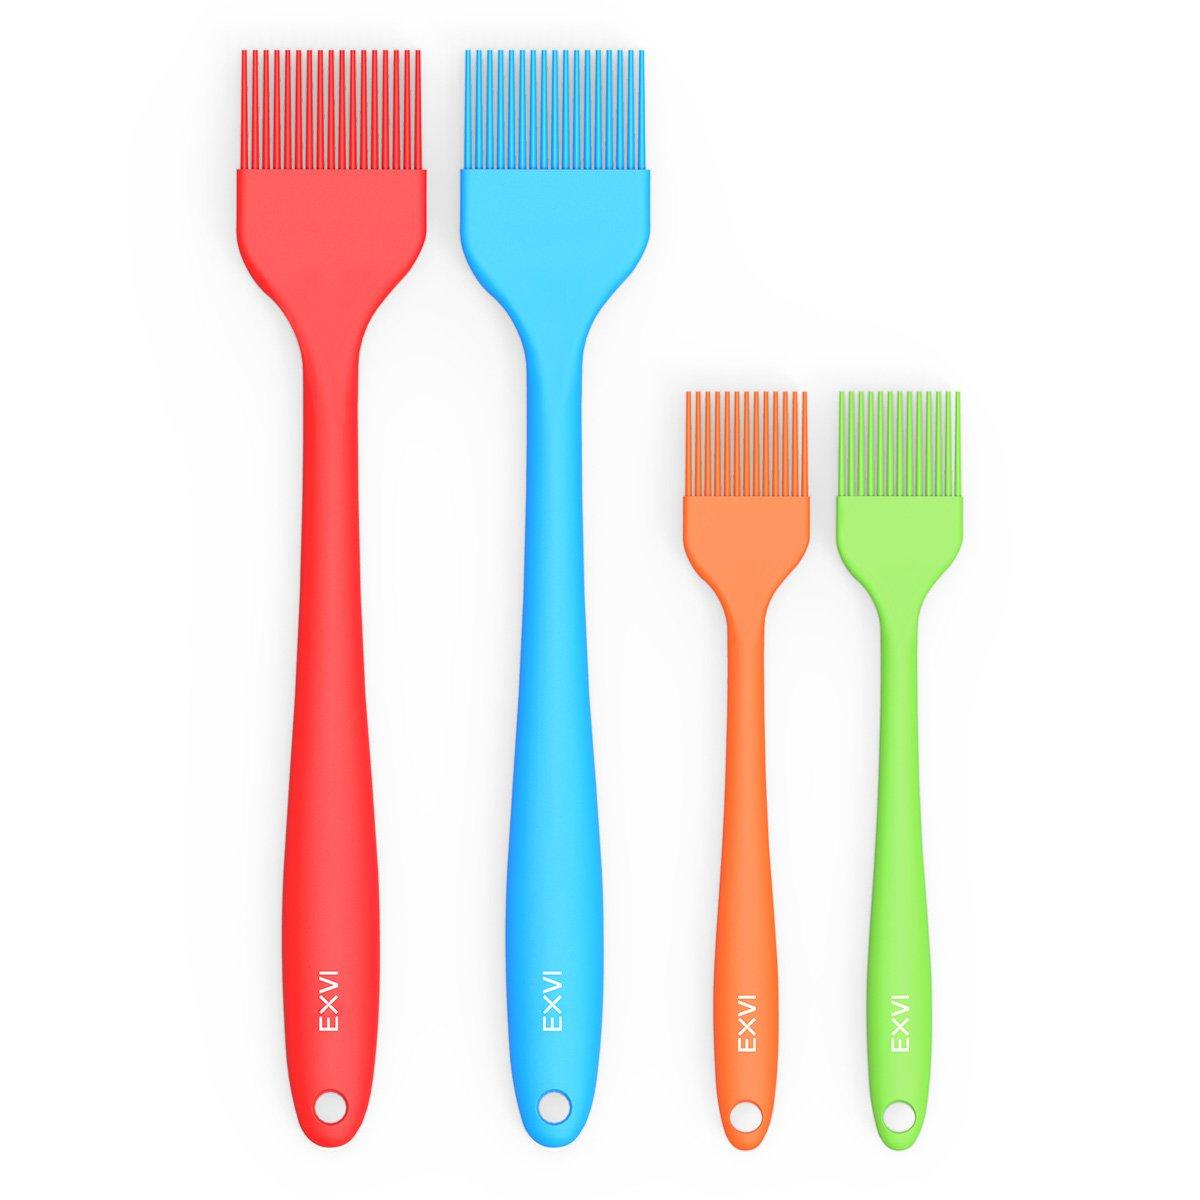 exvi 4-set Silicone Pastry Brush 2x 8 inch & 2x 10 inch COMIN18JU081930 B01M4Q6YIZ   2x 8 inch & 2x 10 inch